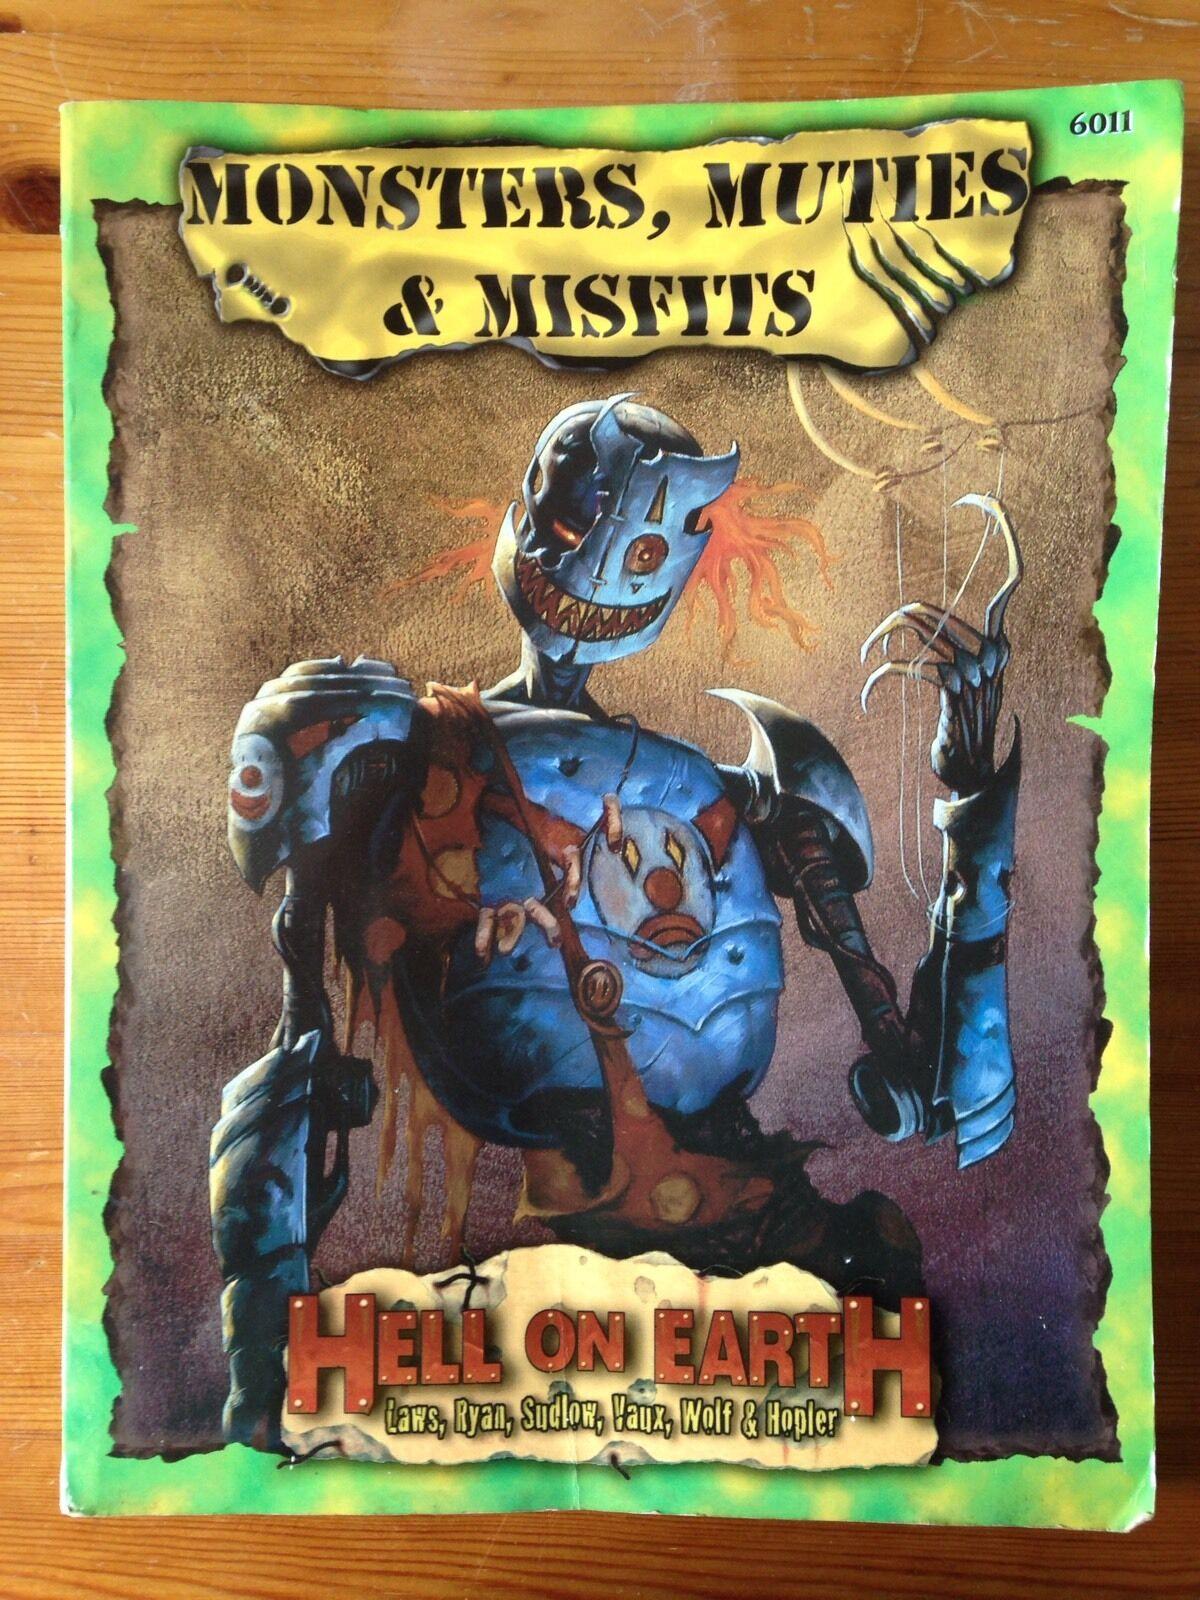 MOSTRI, muties & Misfits   DeadLands  INFERNO sulla terra   Pinnacle   PEG6011